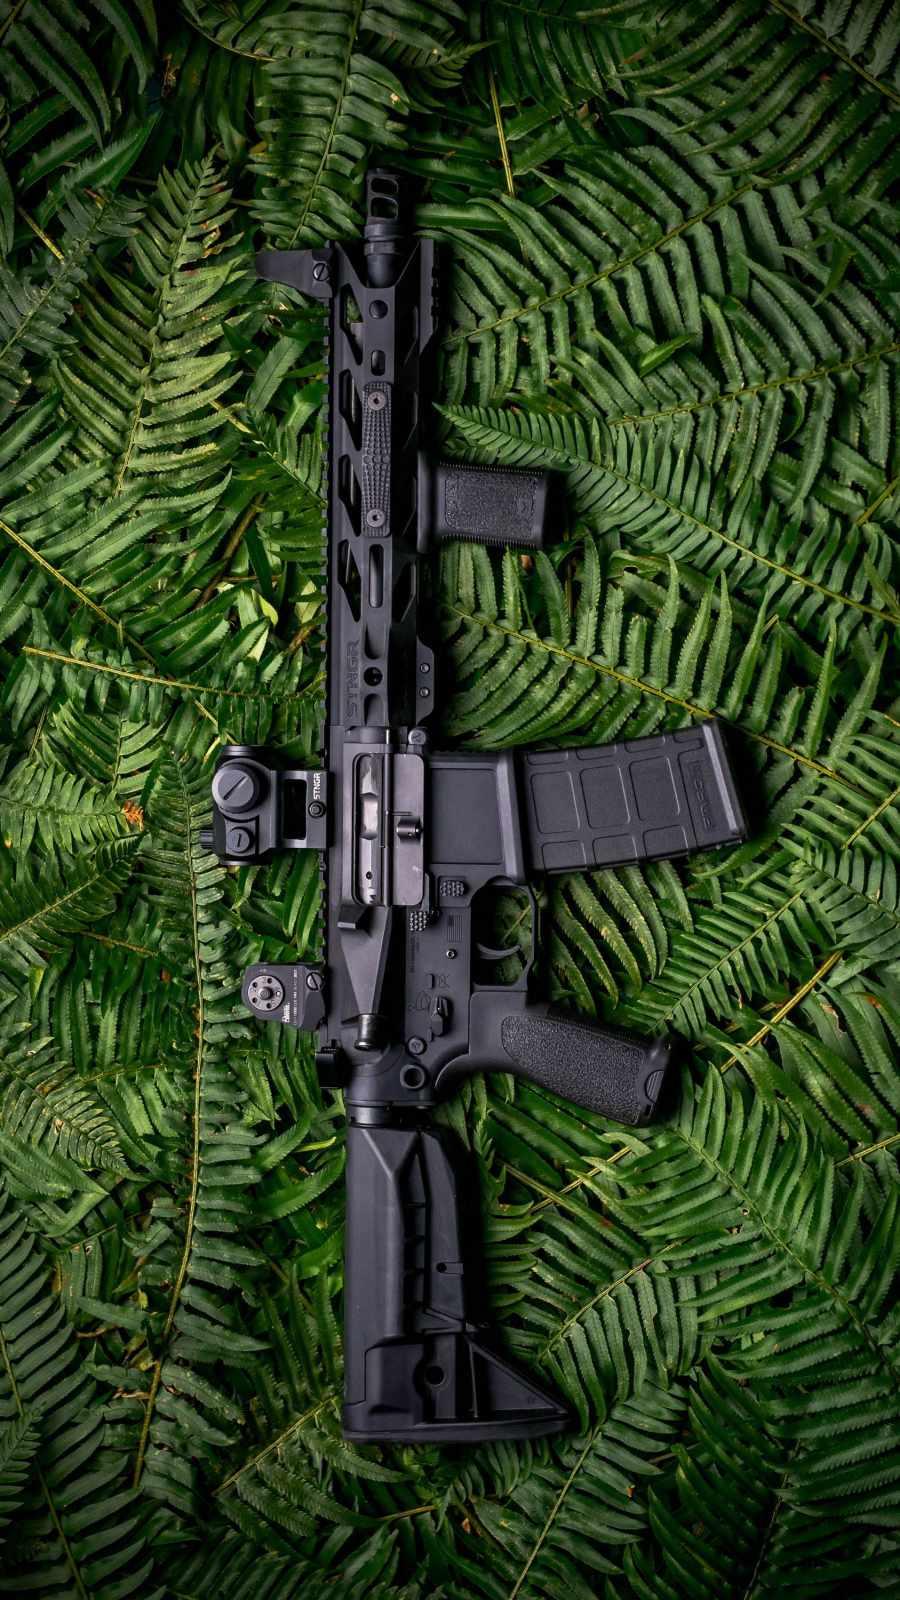 M4 16 Gun iPhone Wallpaper